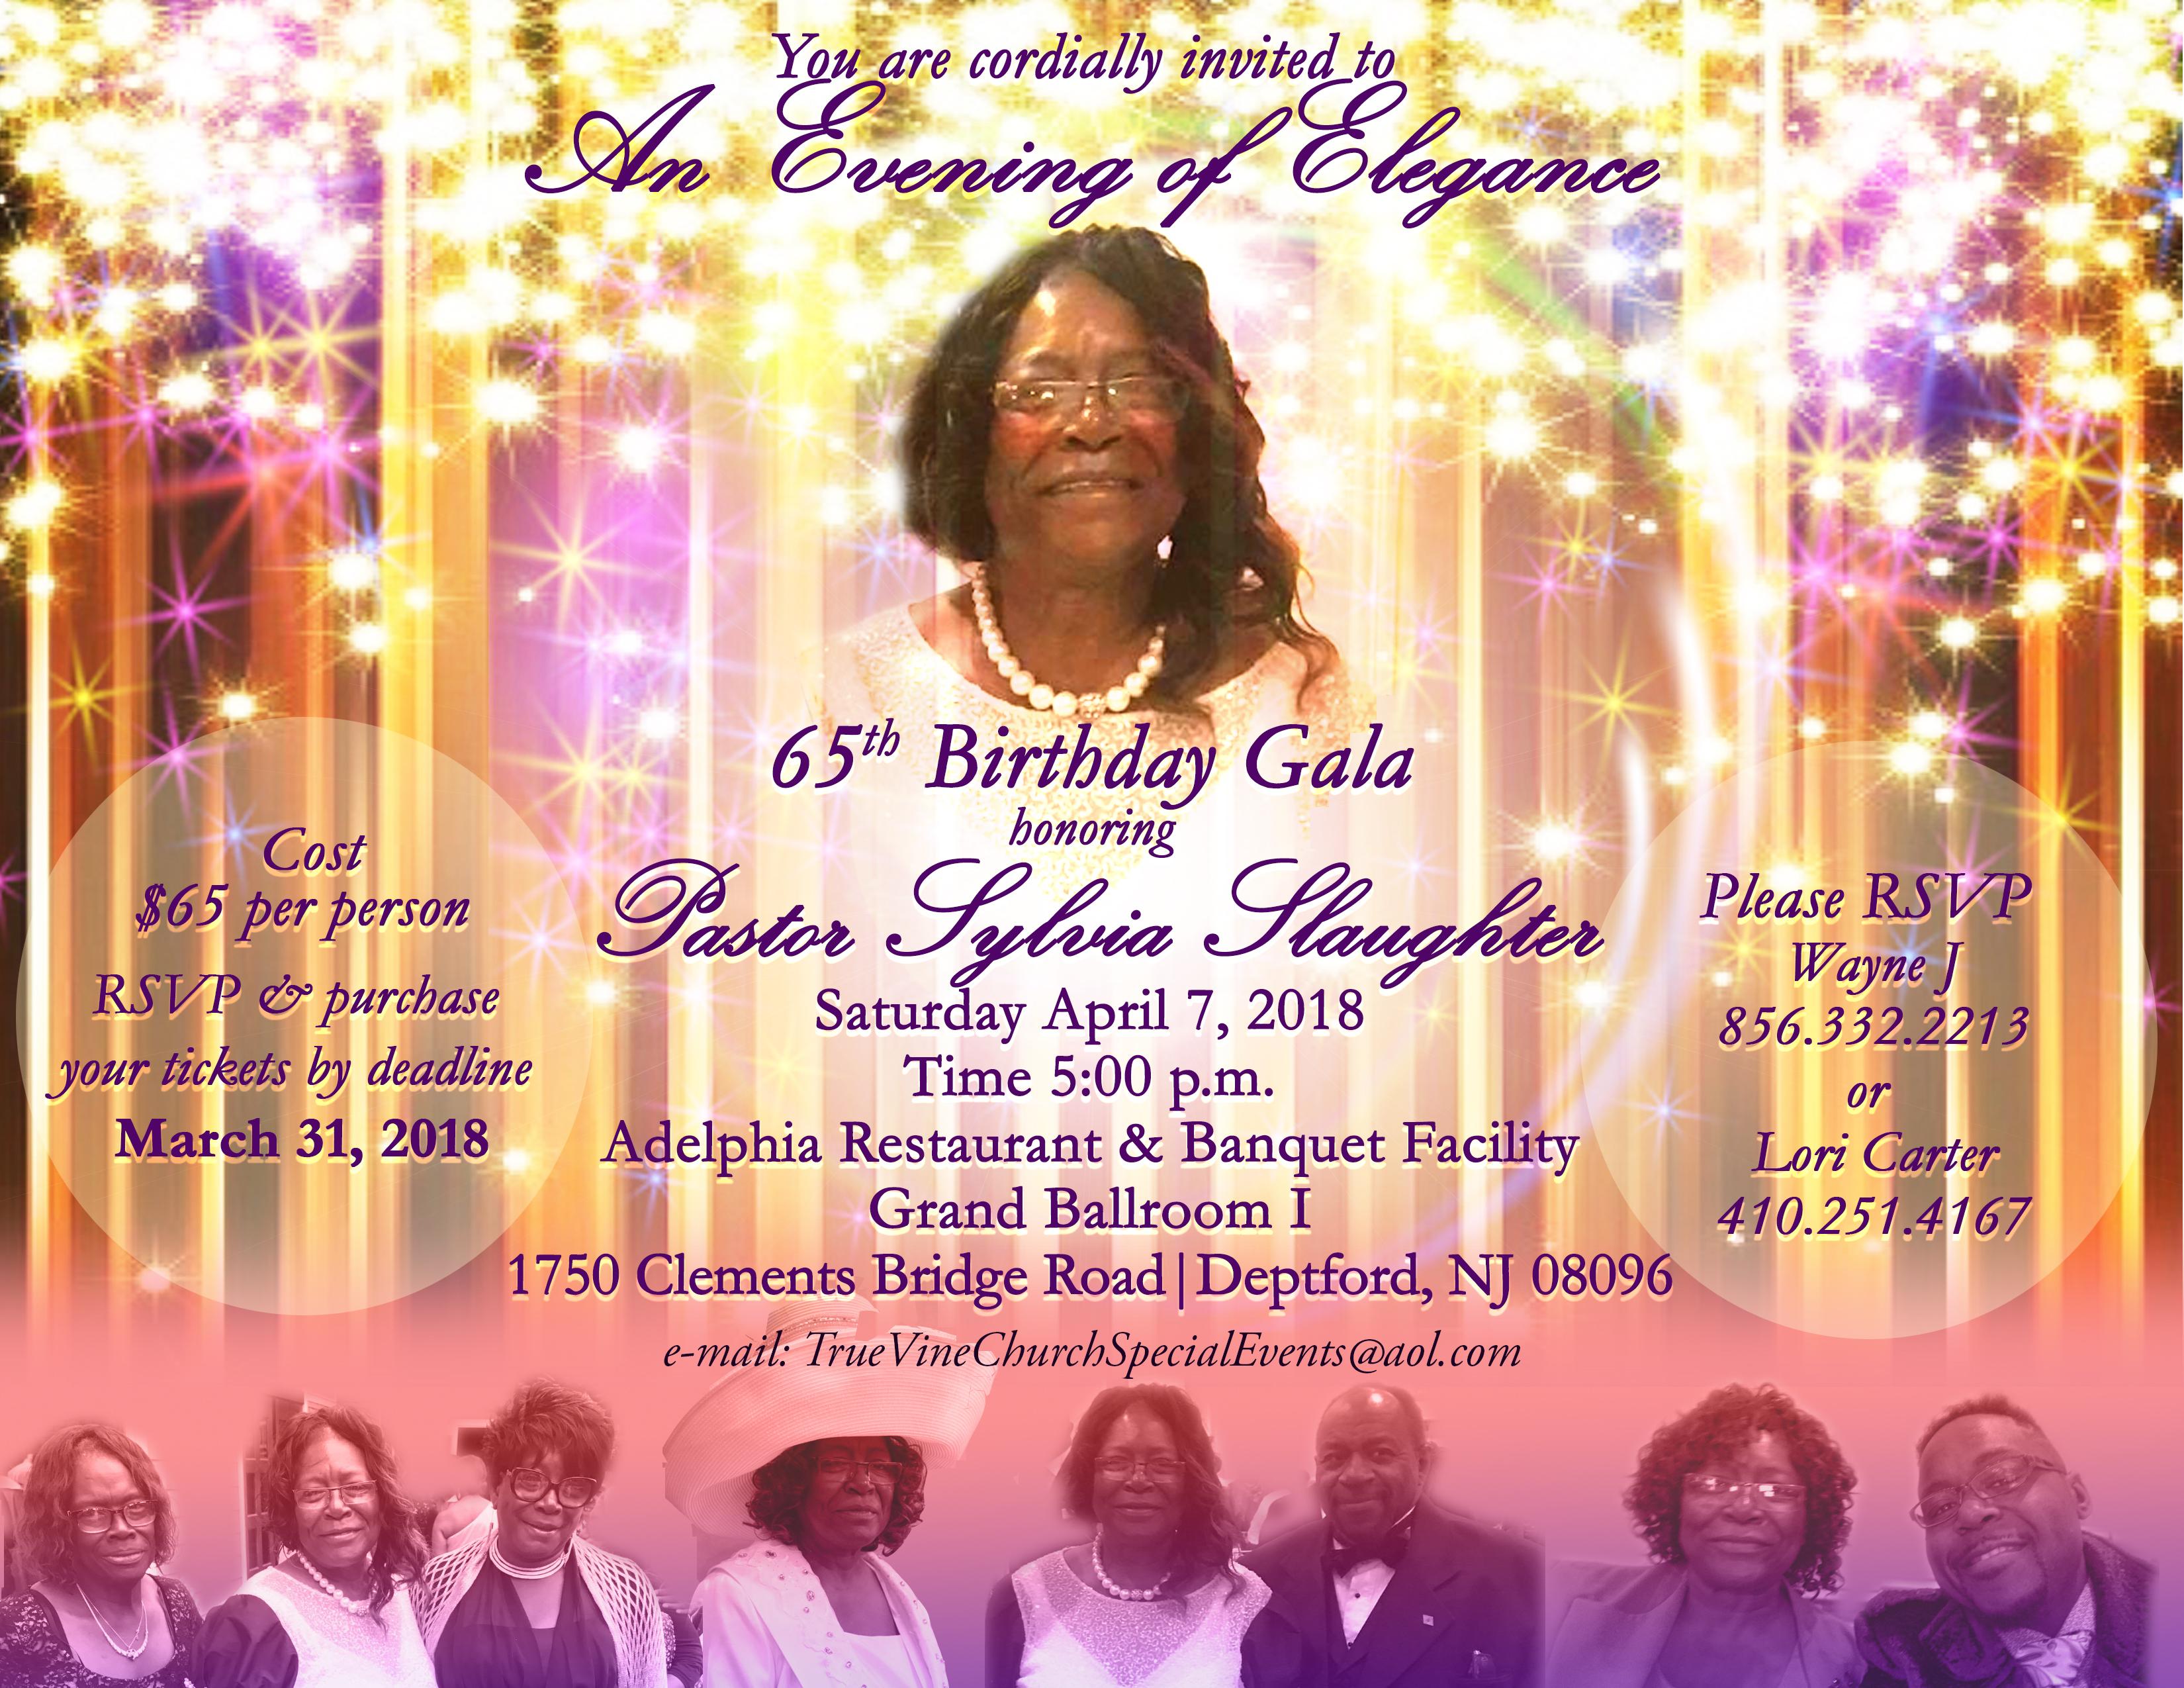 Sylvia inside invite revised